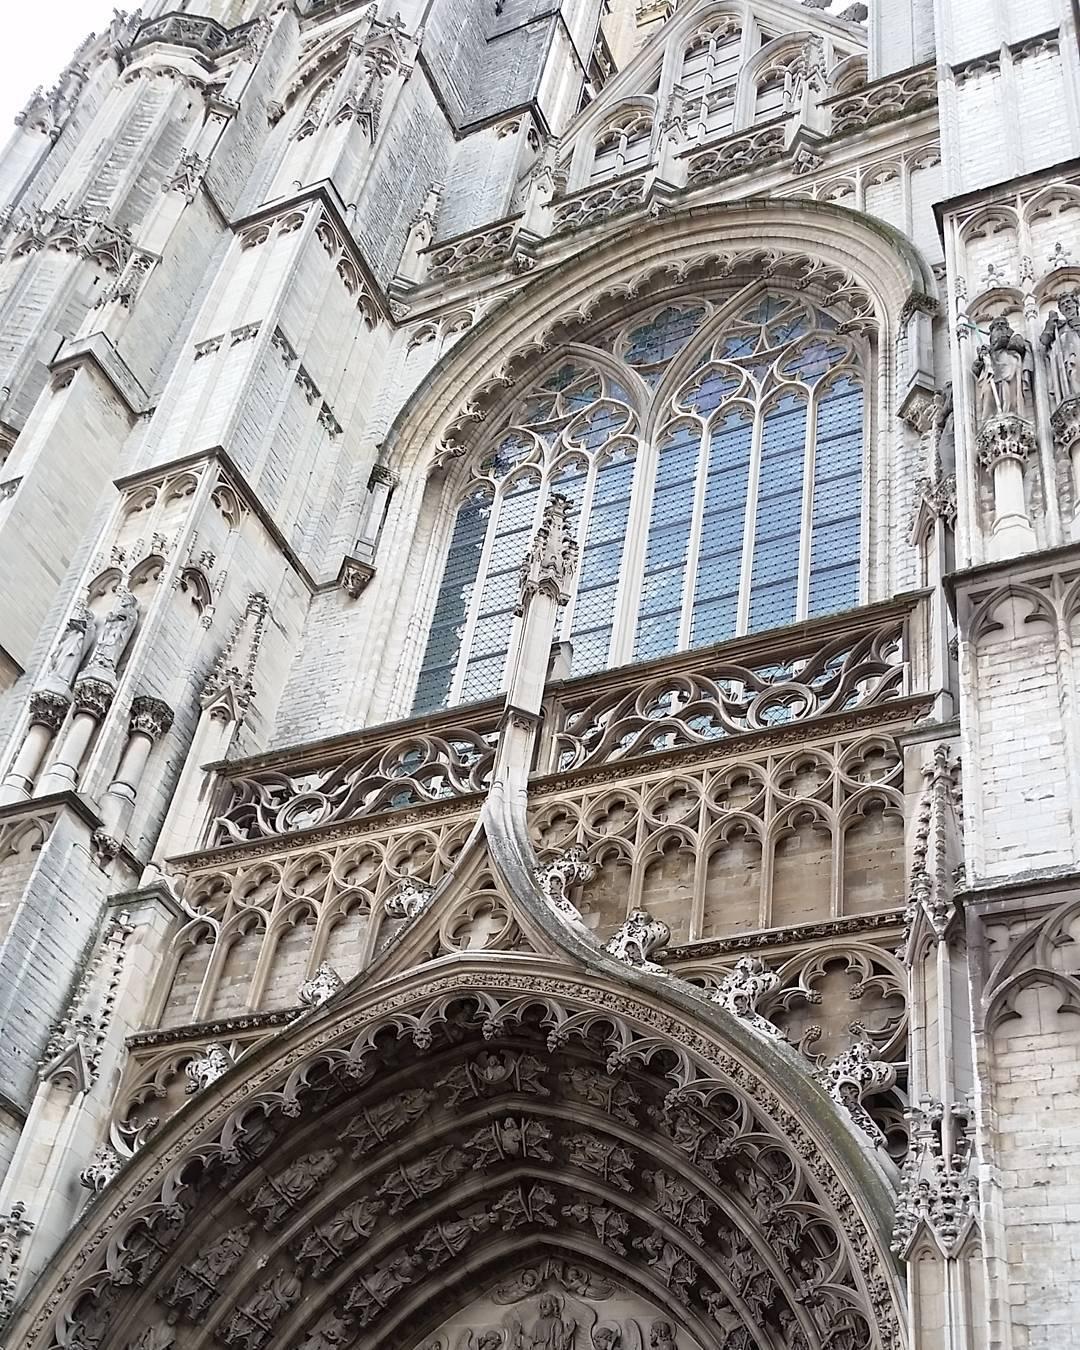 Elaborate sculptures above the cathedral door